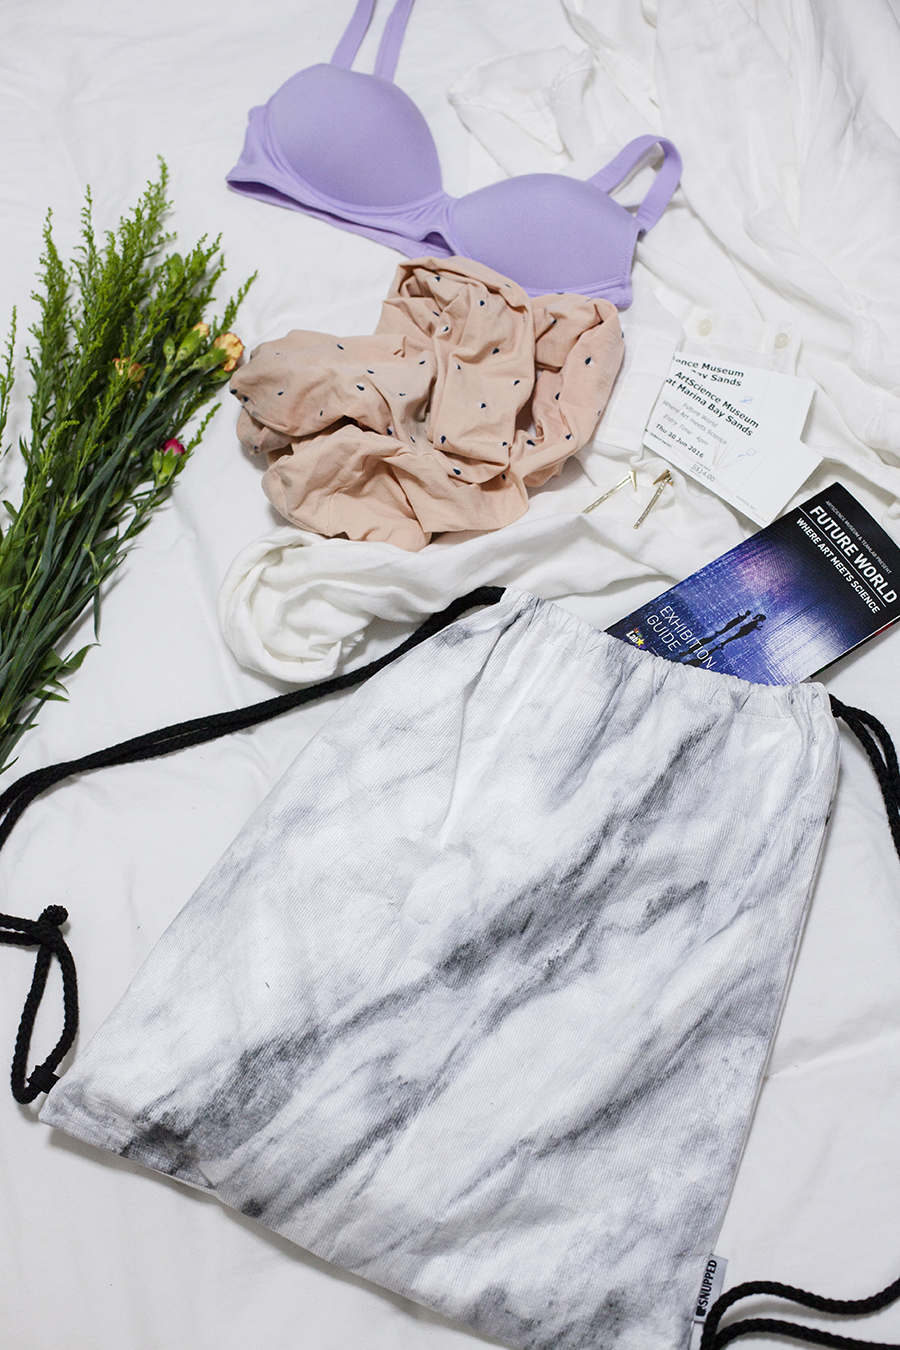 Lilac Purple Wireless Beauty Light bra, Sunmill heart print tights, Future World brochure, Snupped marble print drawstring bag .